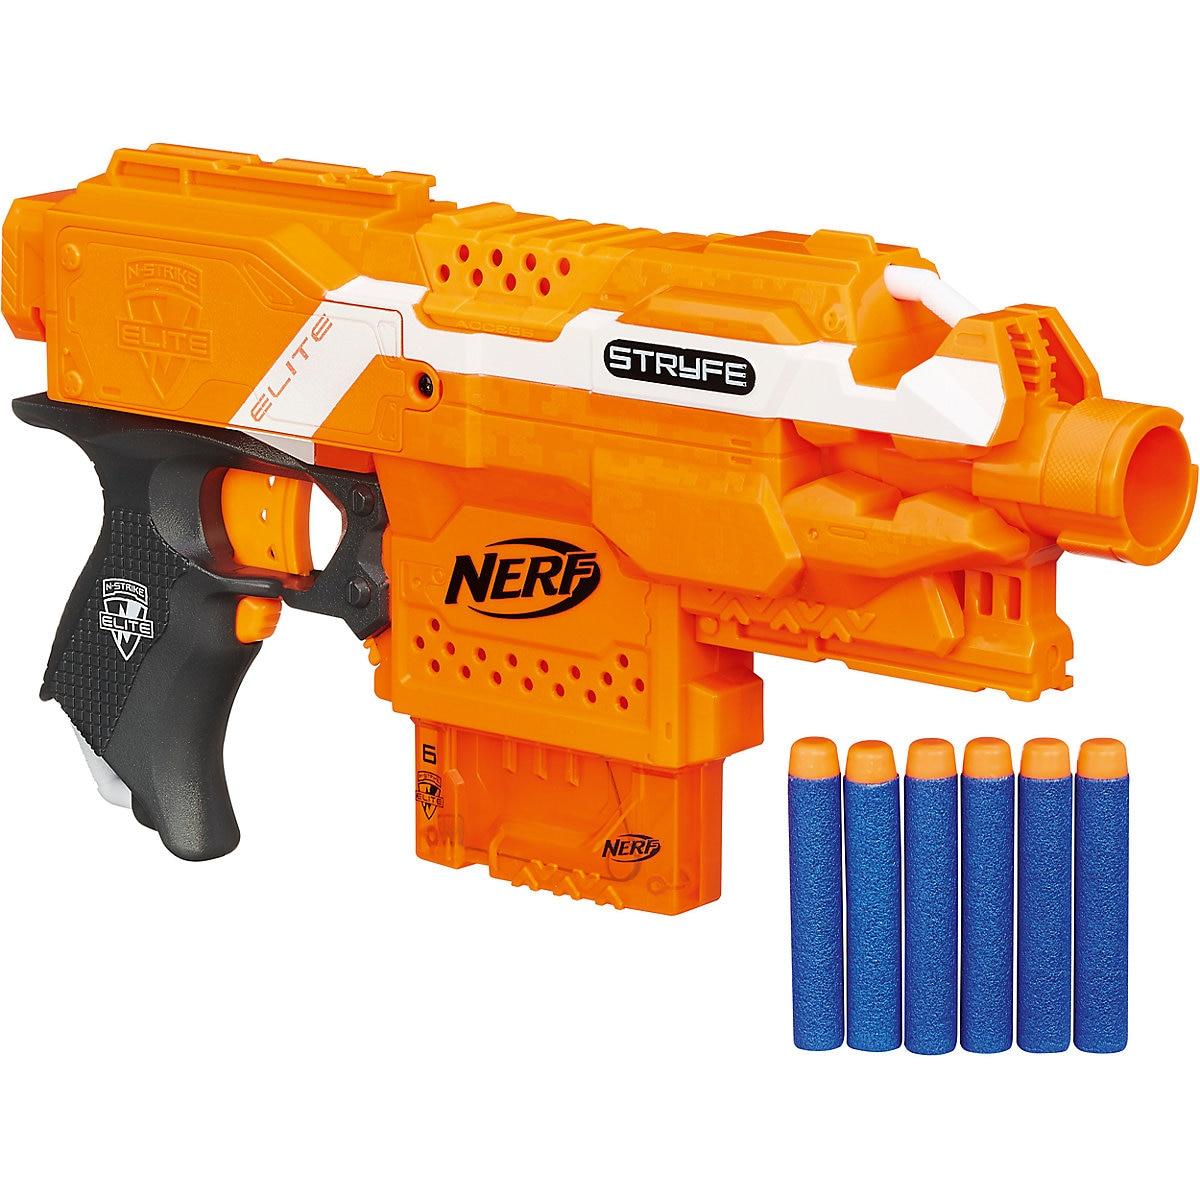 NERF Toy Guns 2624497 gun weapon toys games pneumatic blaster boy orbiz revolver Outdoor Fun Sports MTpromo